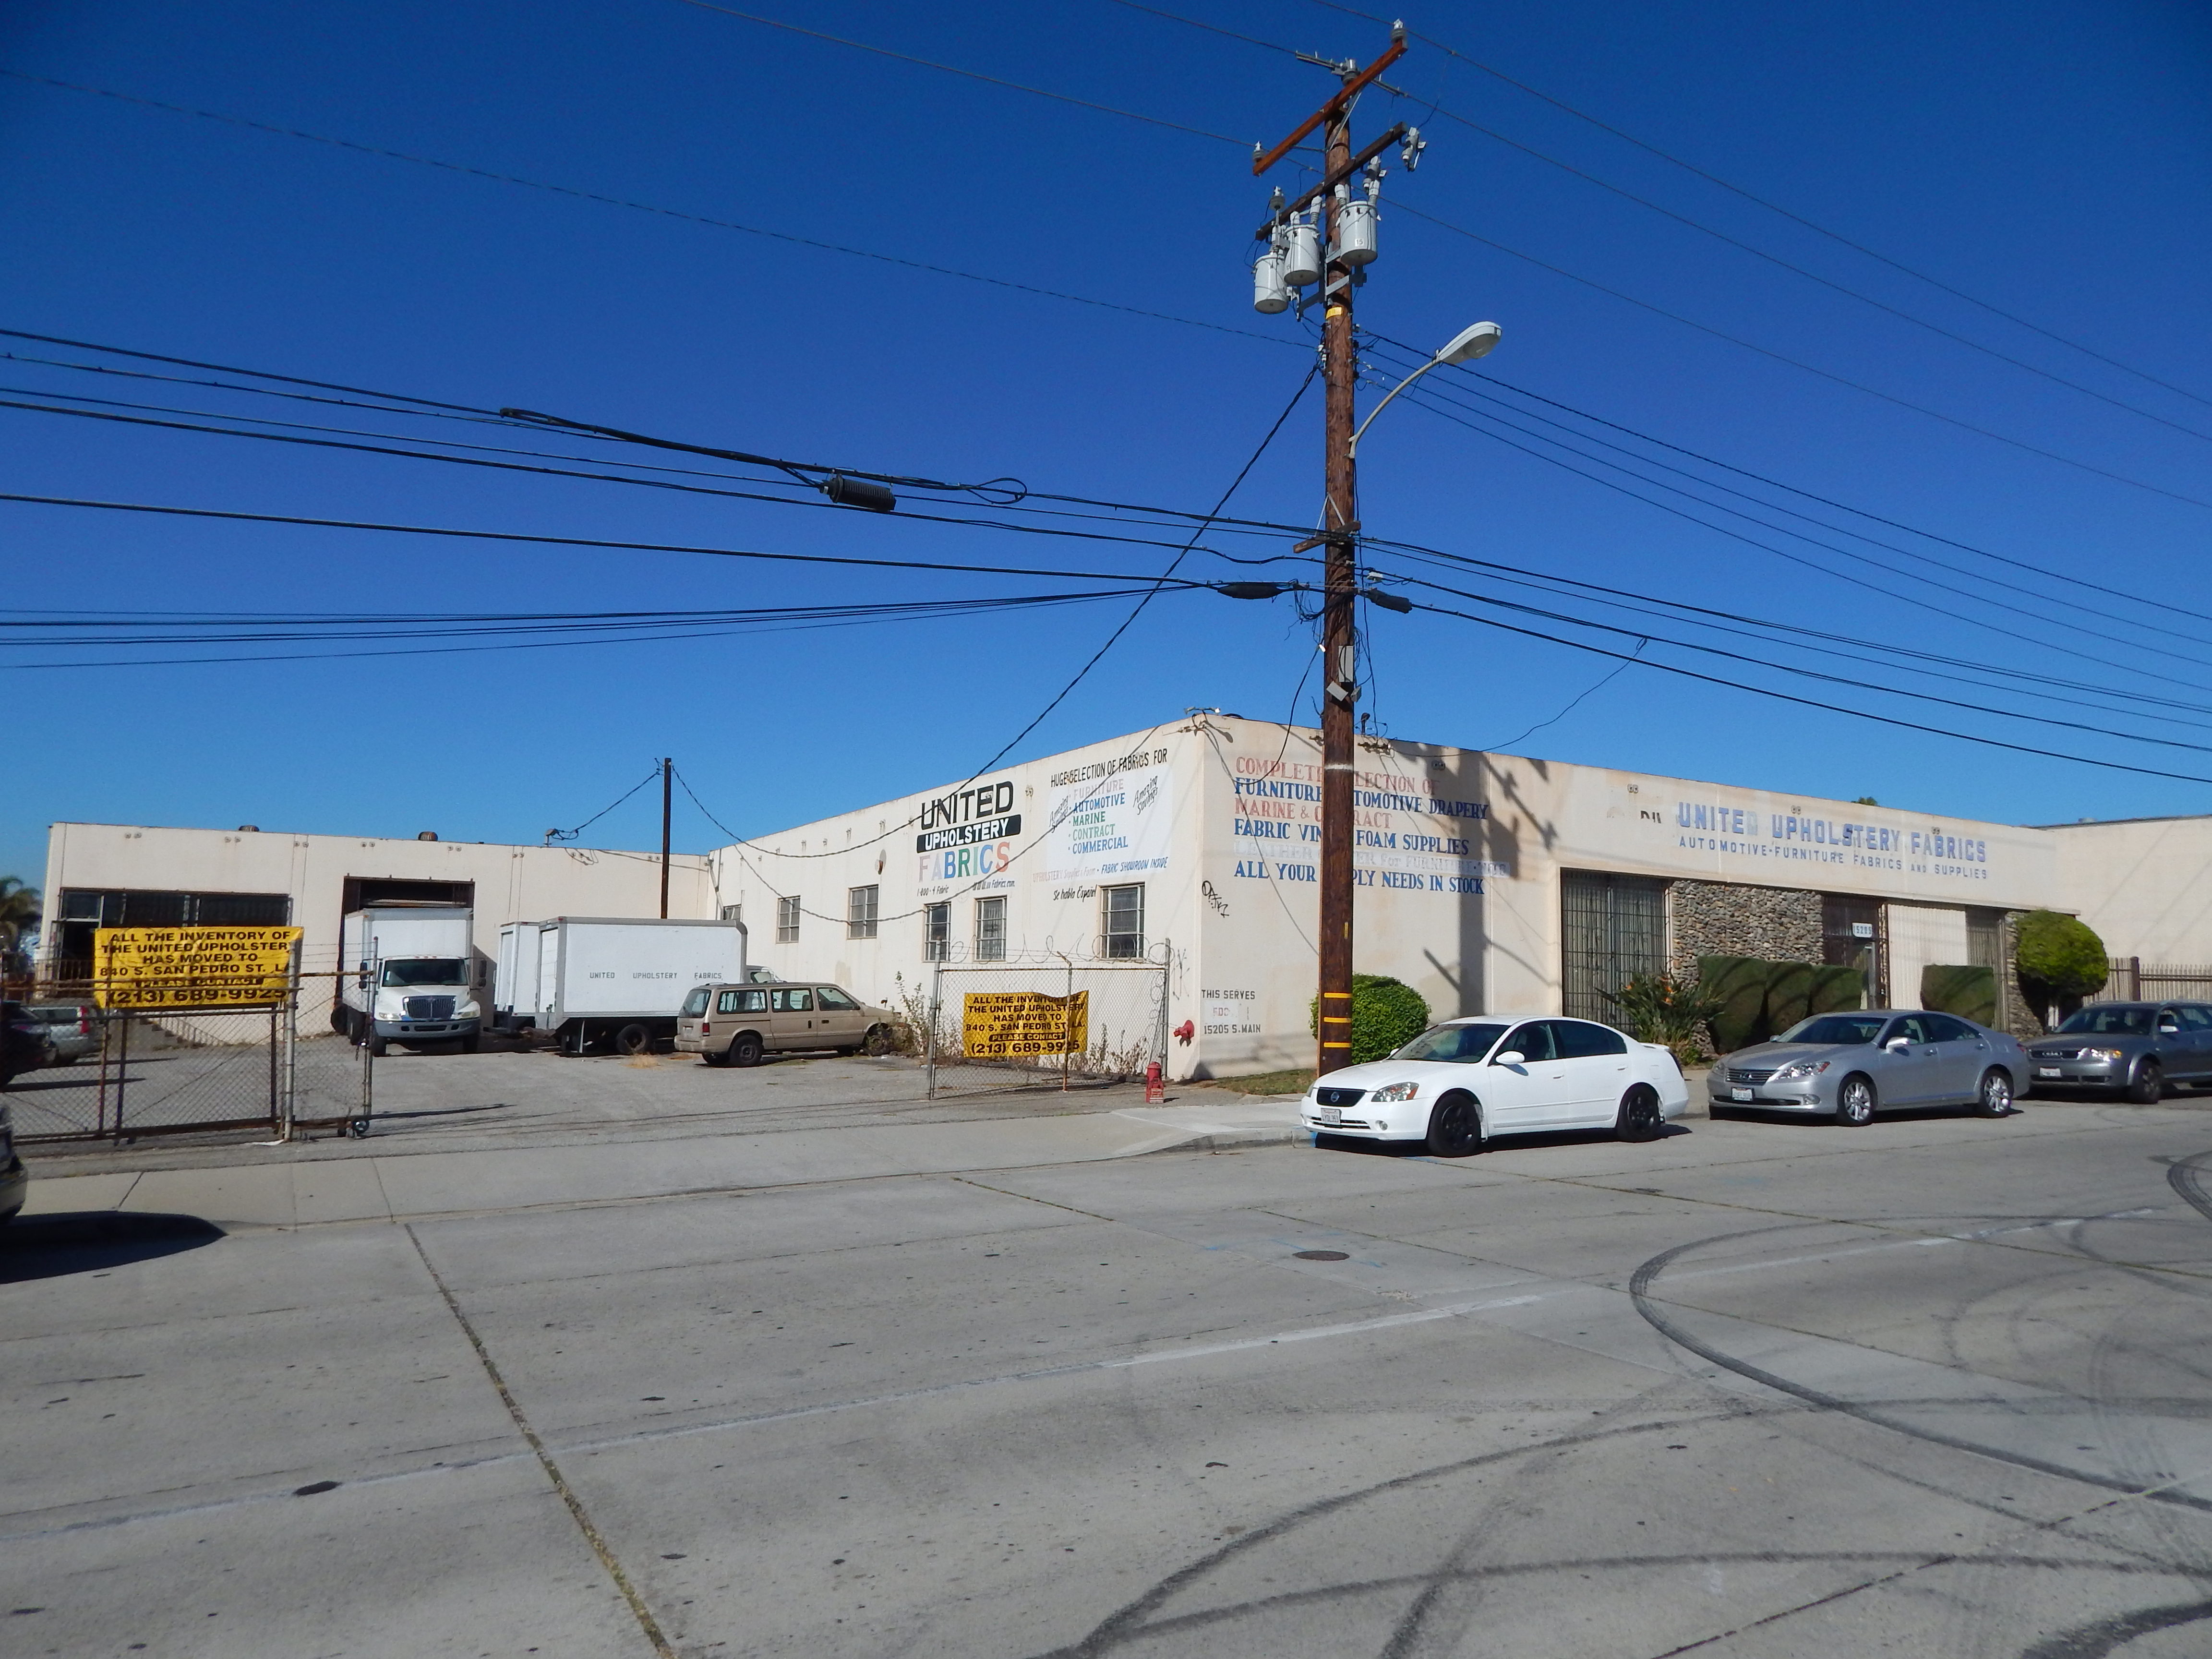 15205 S Main St, Gardena, CA 90248